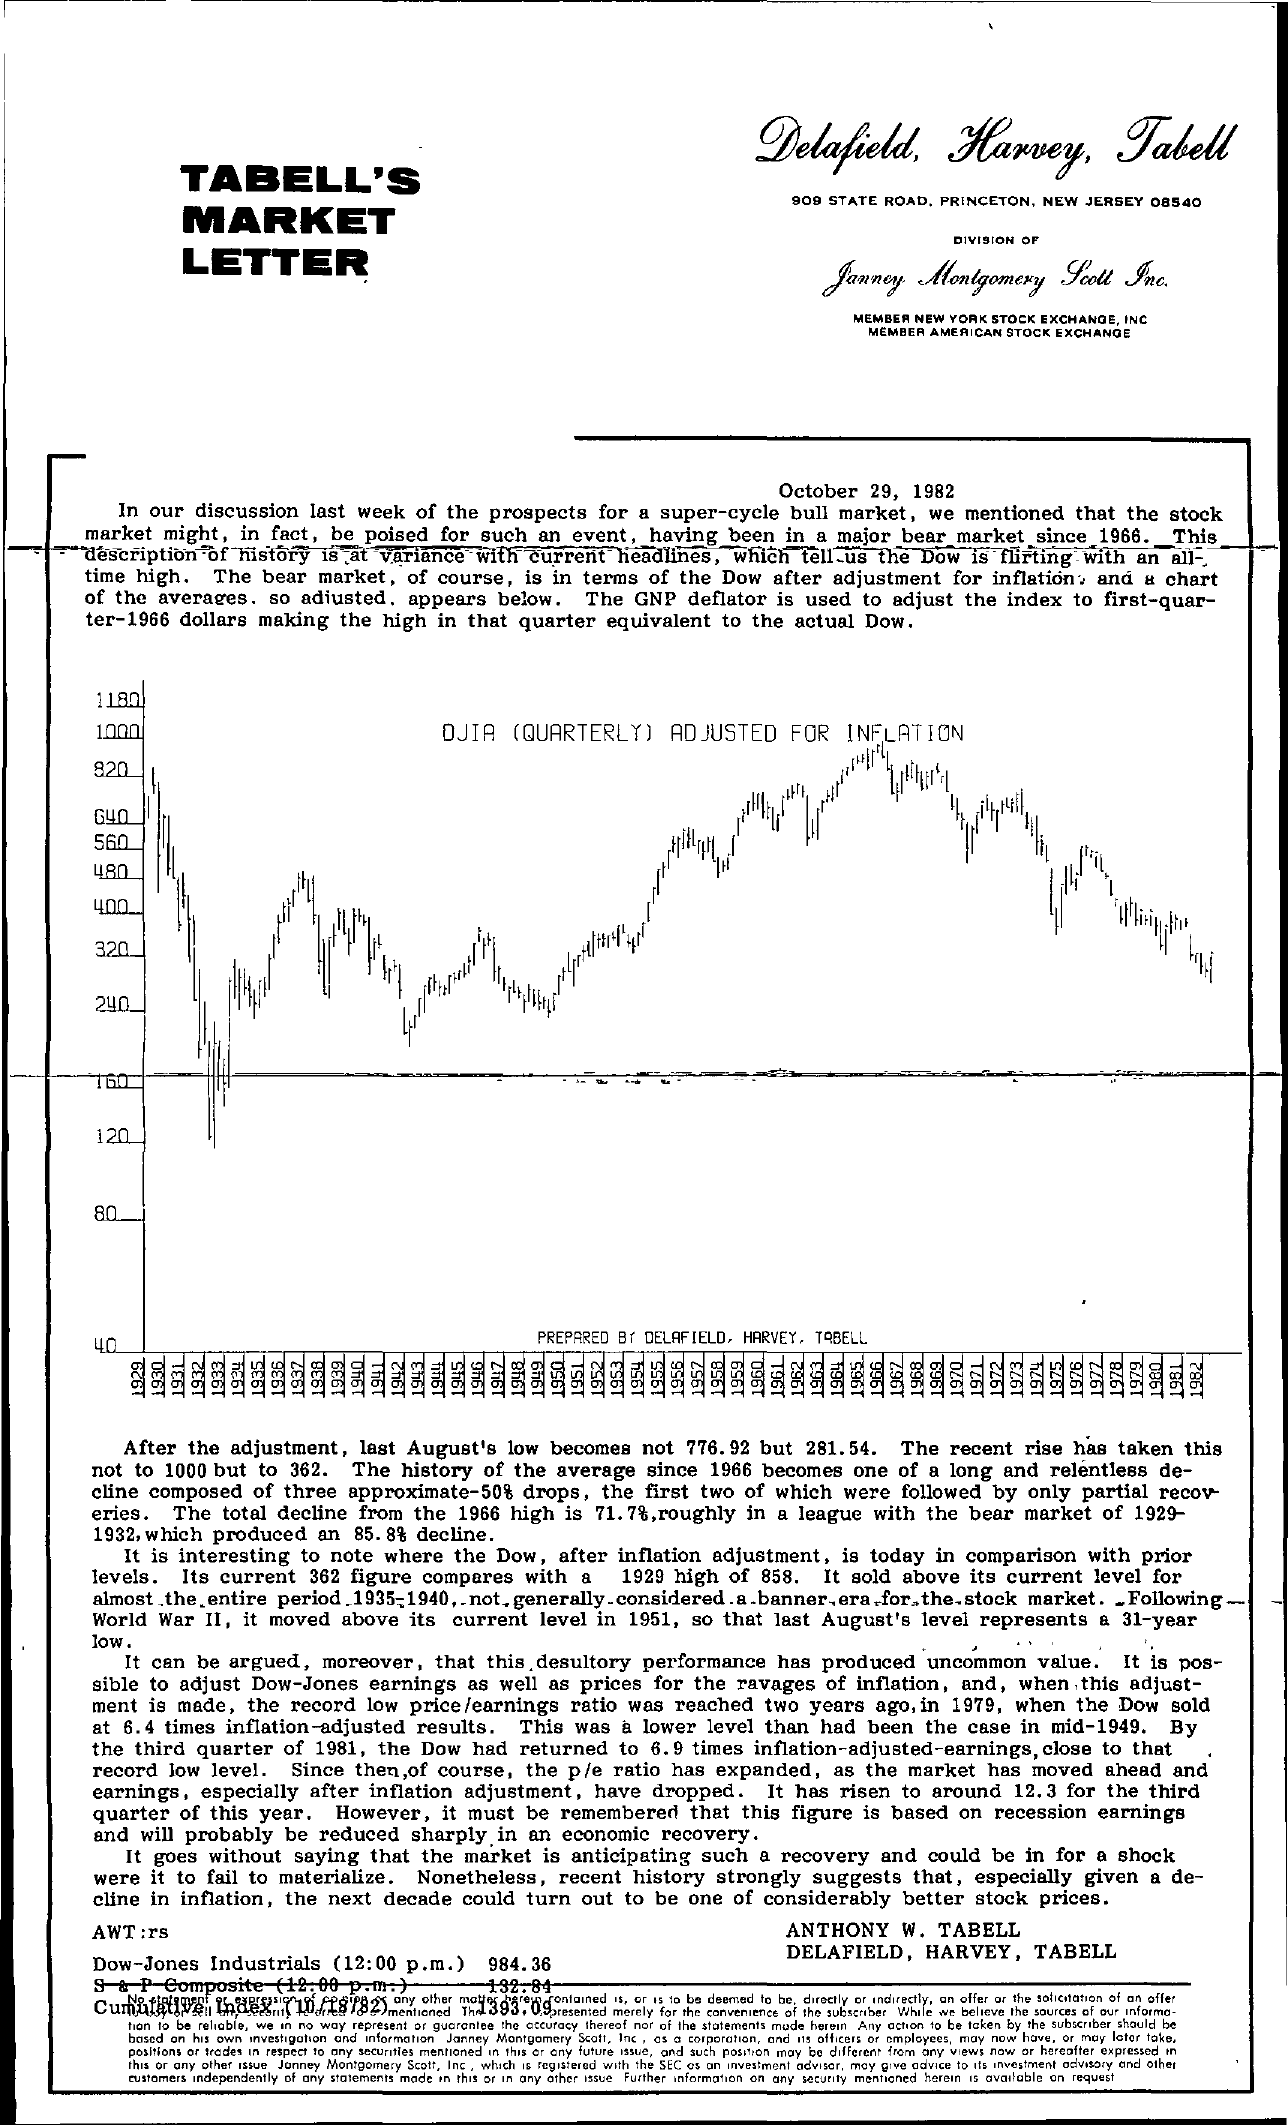 Tabell's Market Letter - October 29, 1982